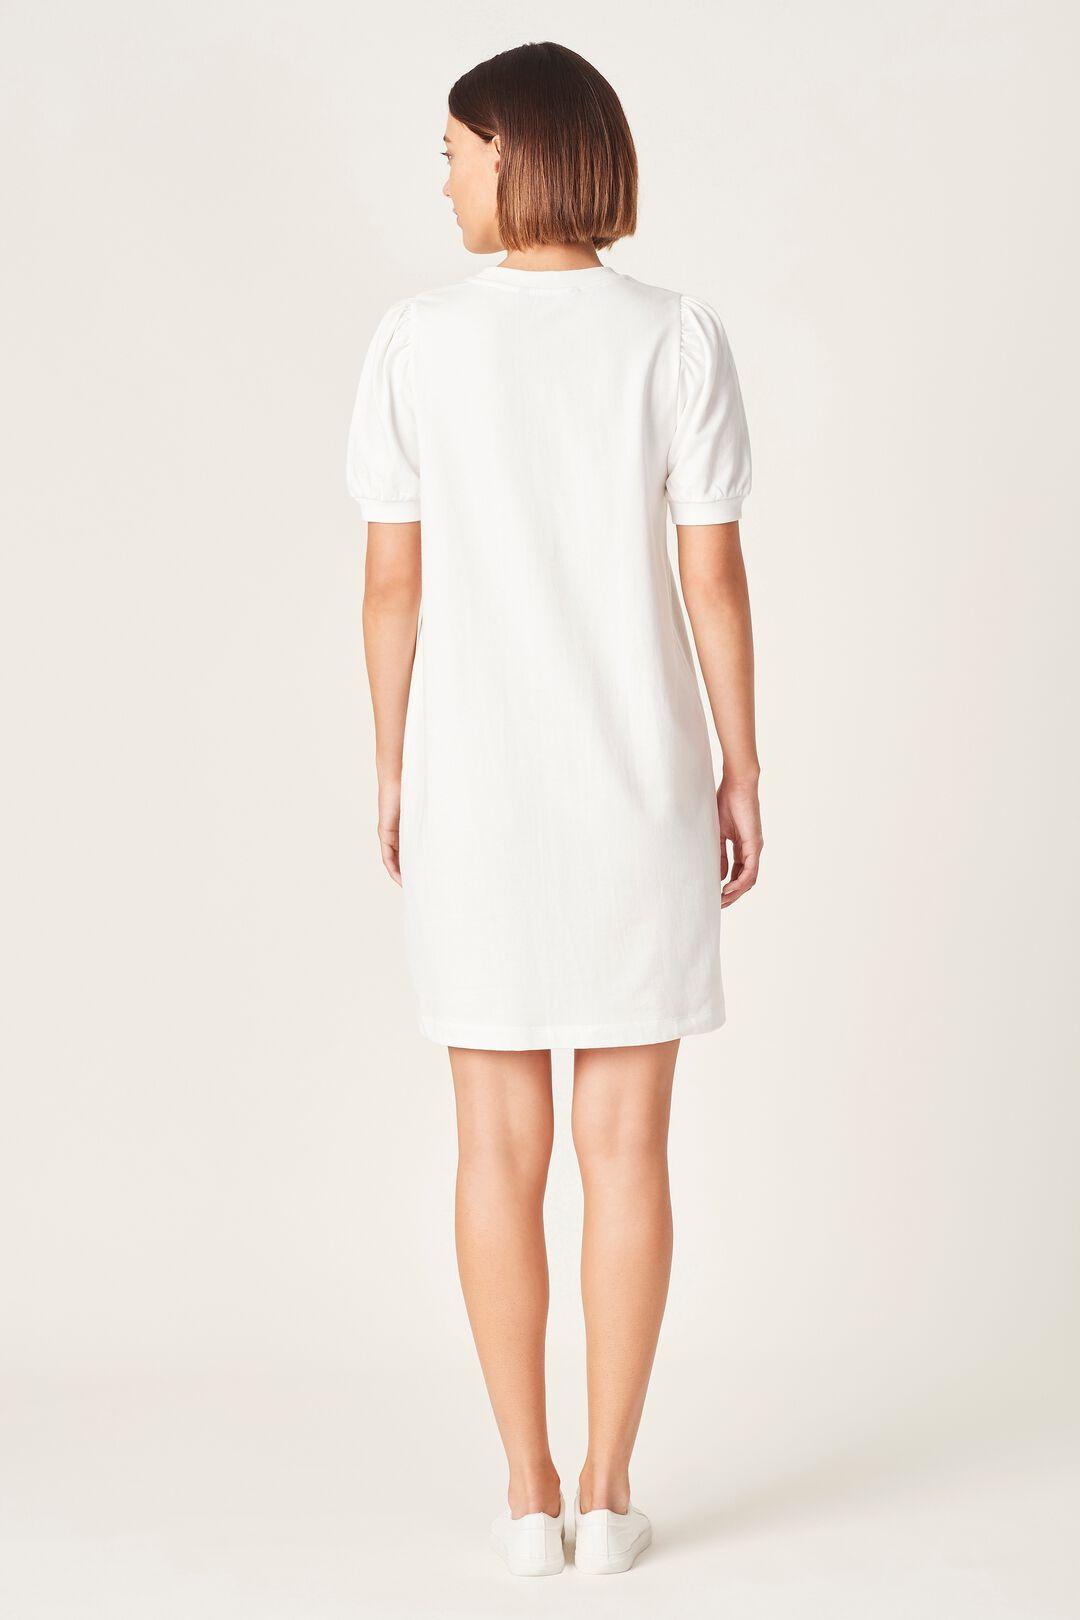 PUFF SLEEVE SWEAT DRESS  WHITE  hi-res